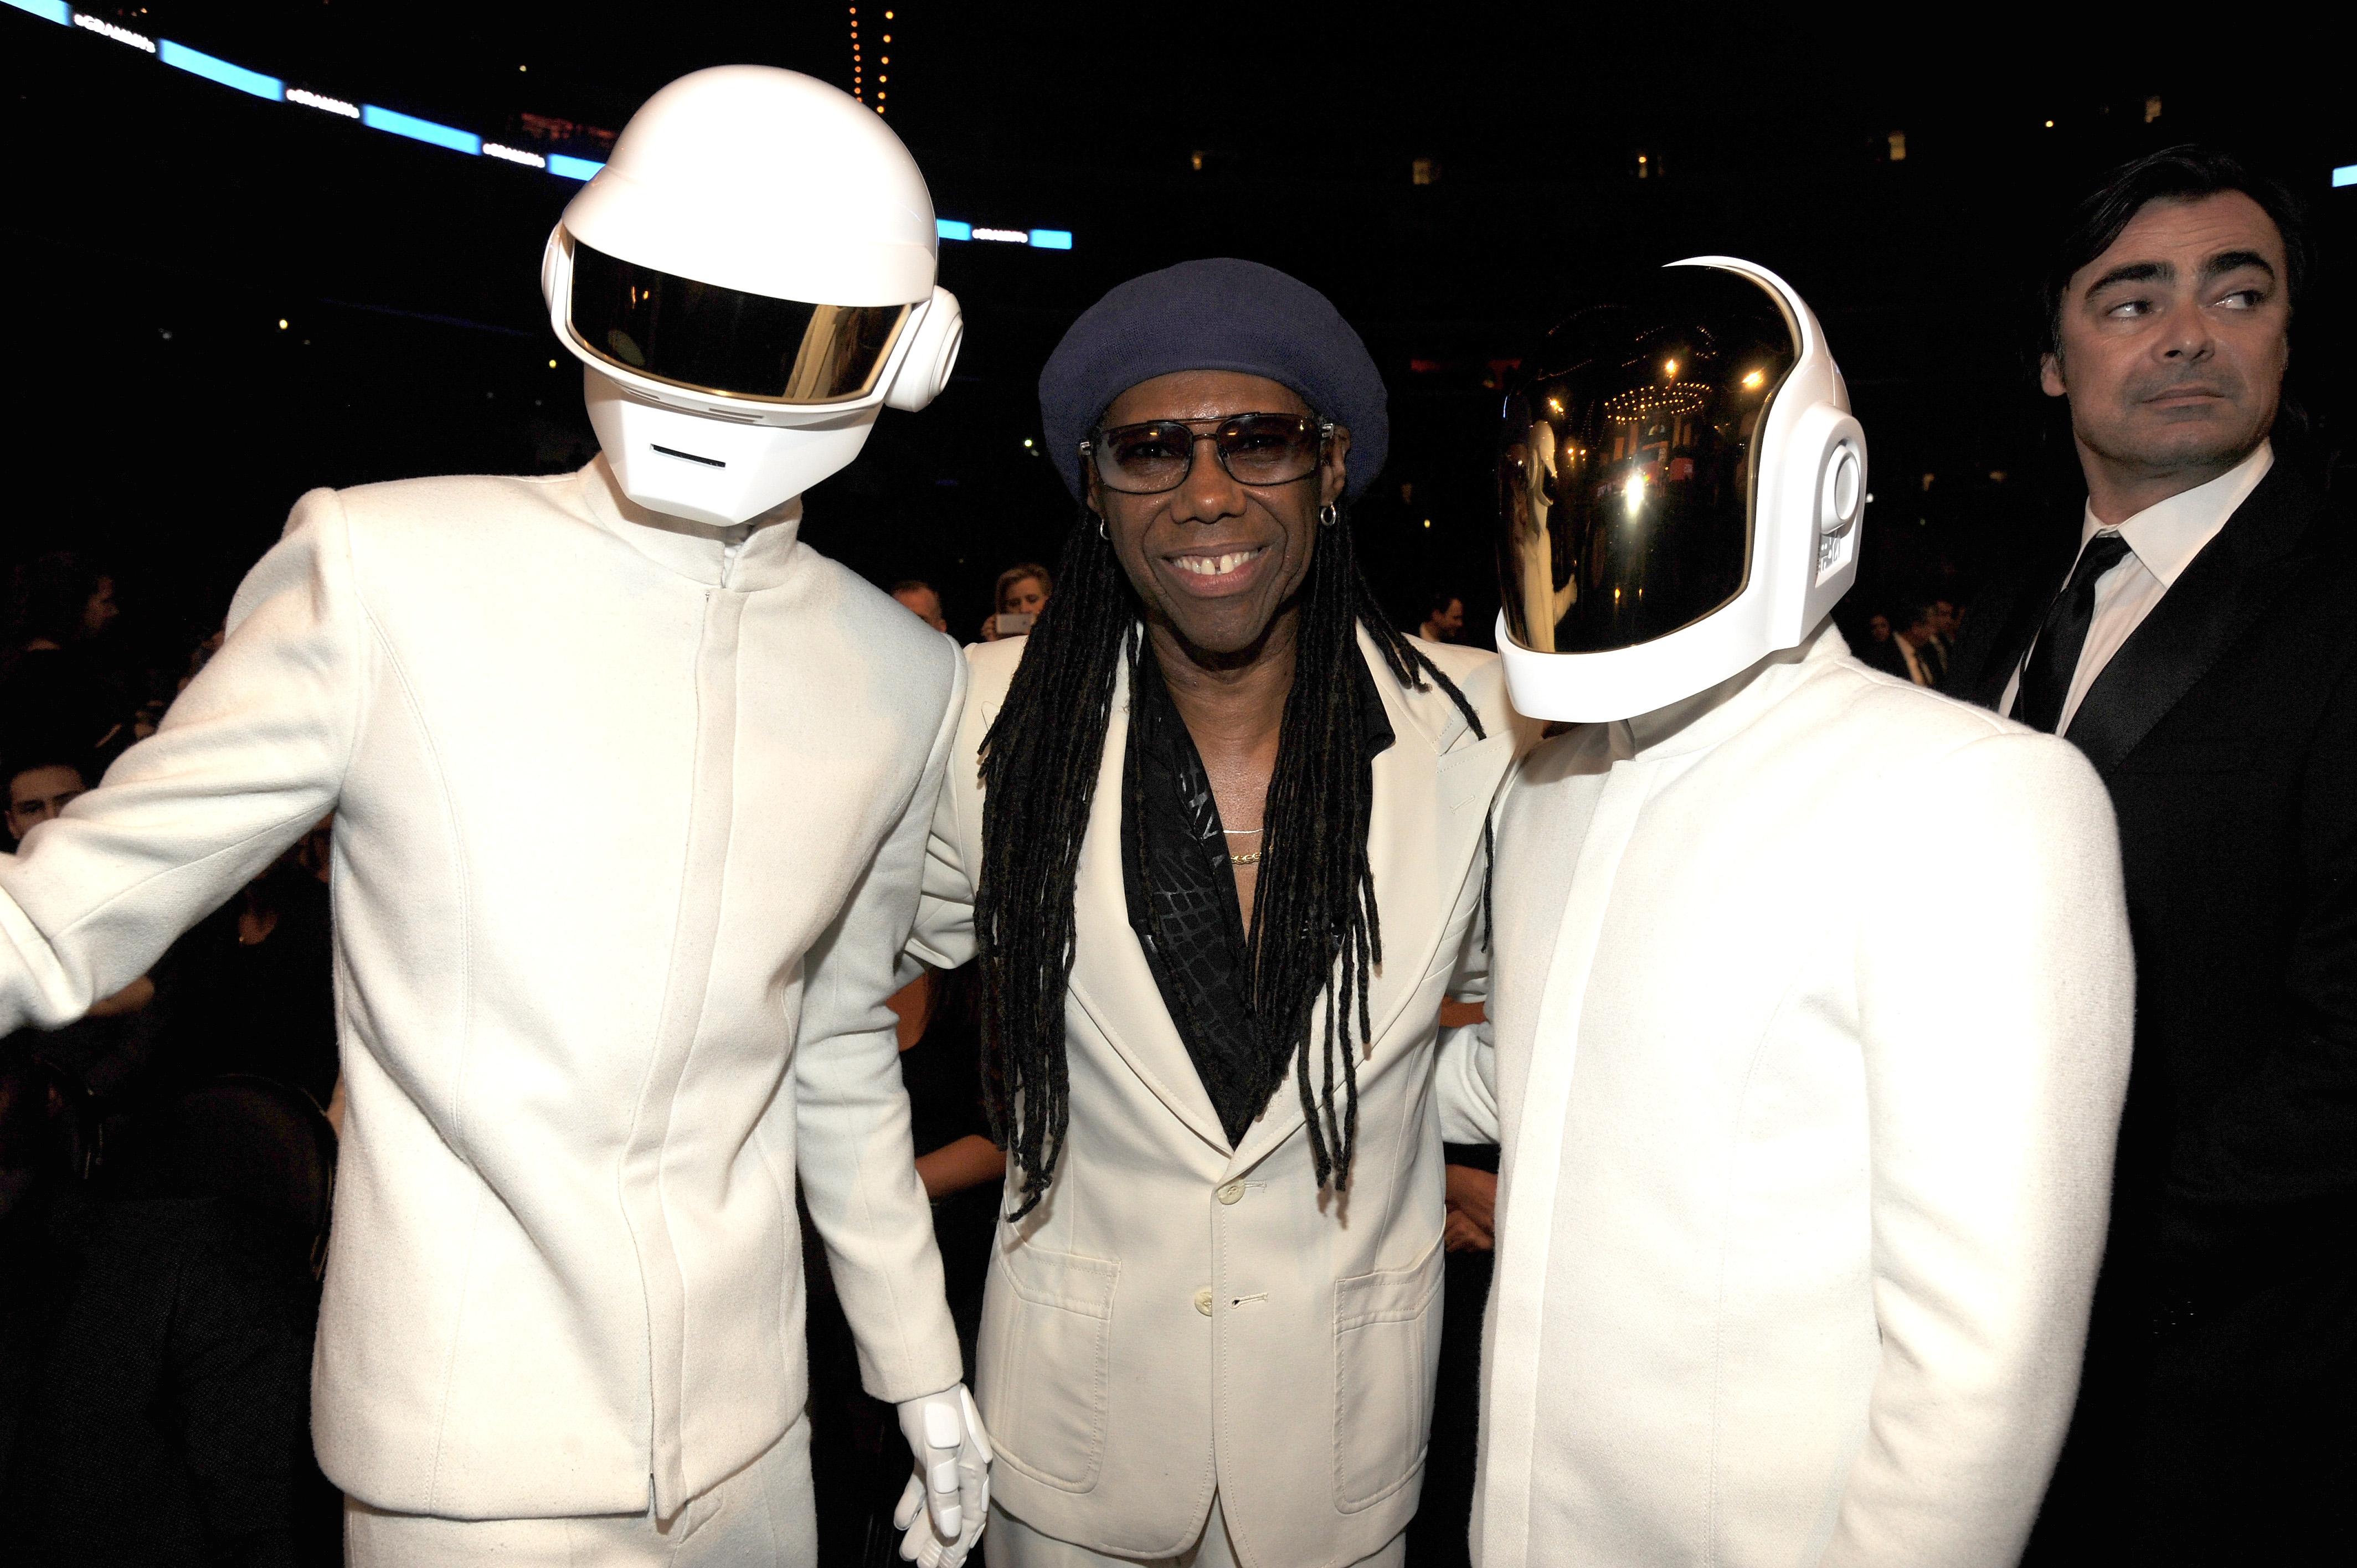 LOS ANGELES, CA - JANUARY 26:  (L-R) Daft Punk's Thomas Bangalter, musician Nile Rodgers and Daft Punk's Guy-Manuel de Homem-